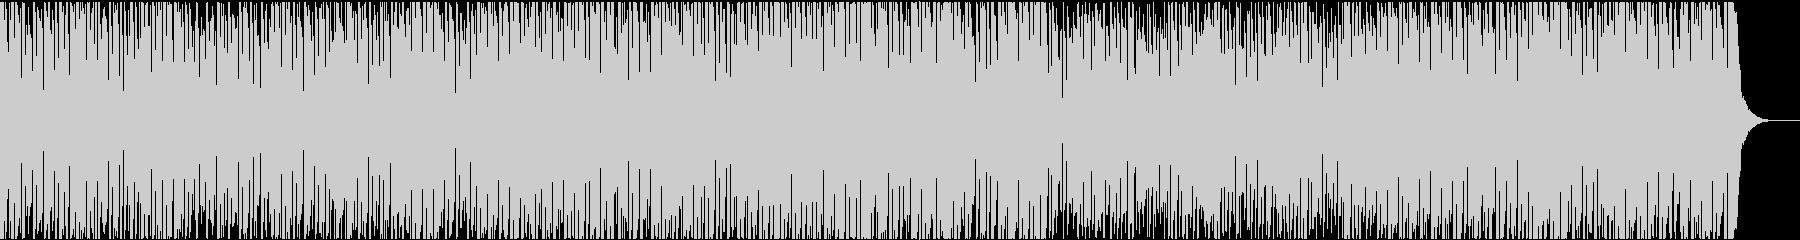 News6 16bit48kHzVerの未再生の波形